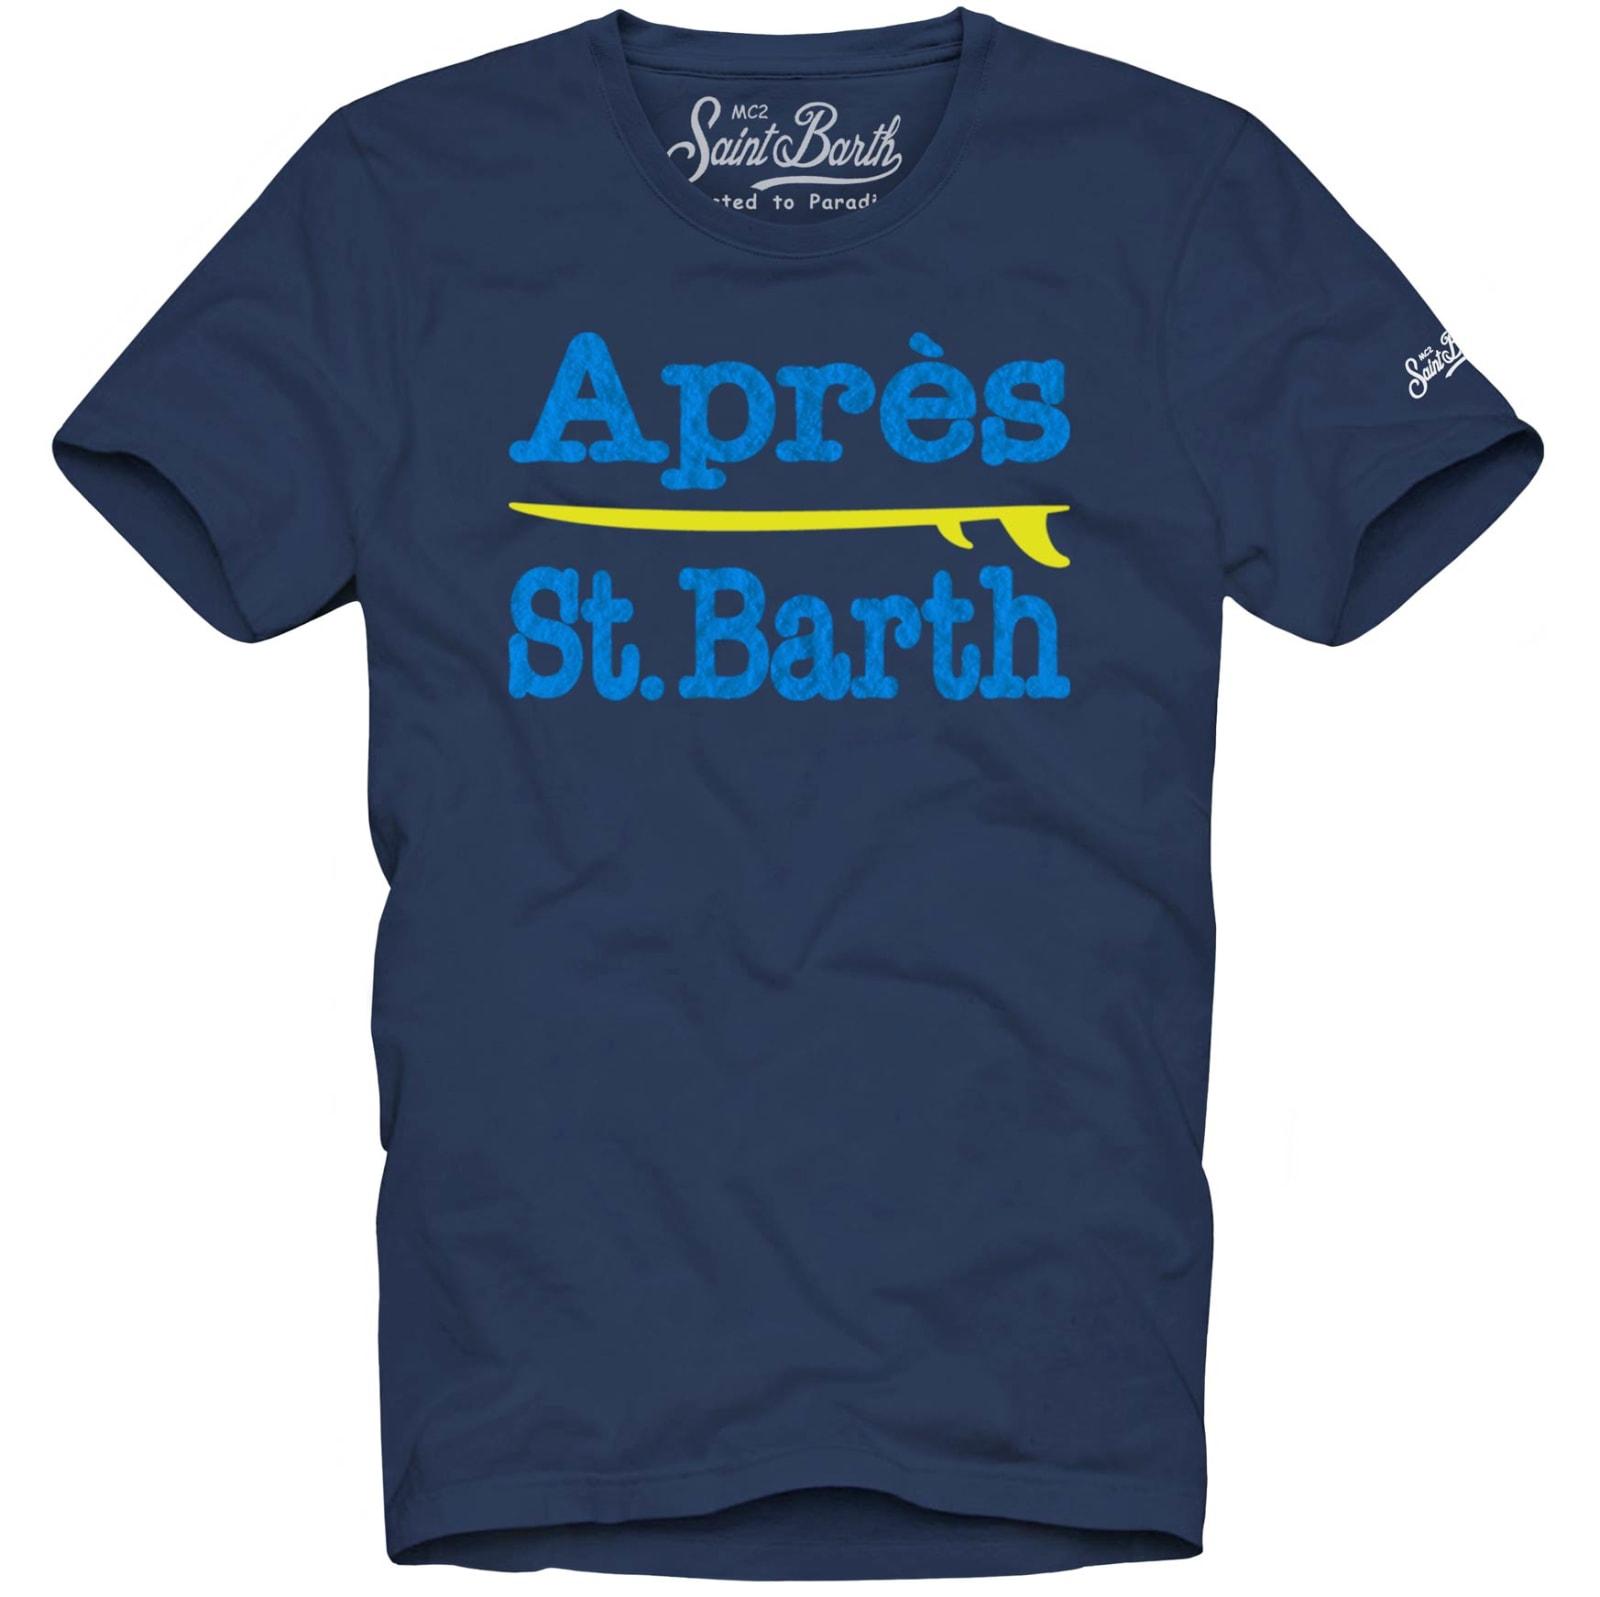 Man T-shirt Après St. Barth Graphic